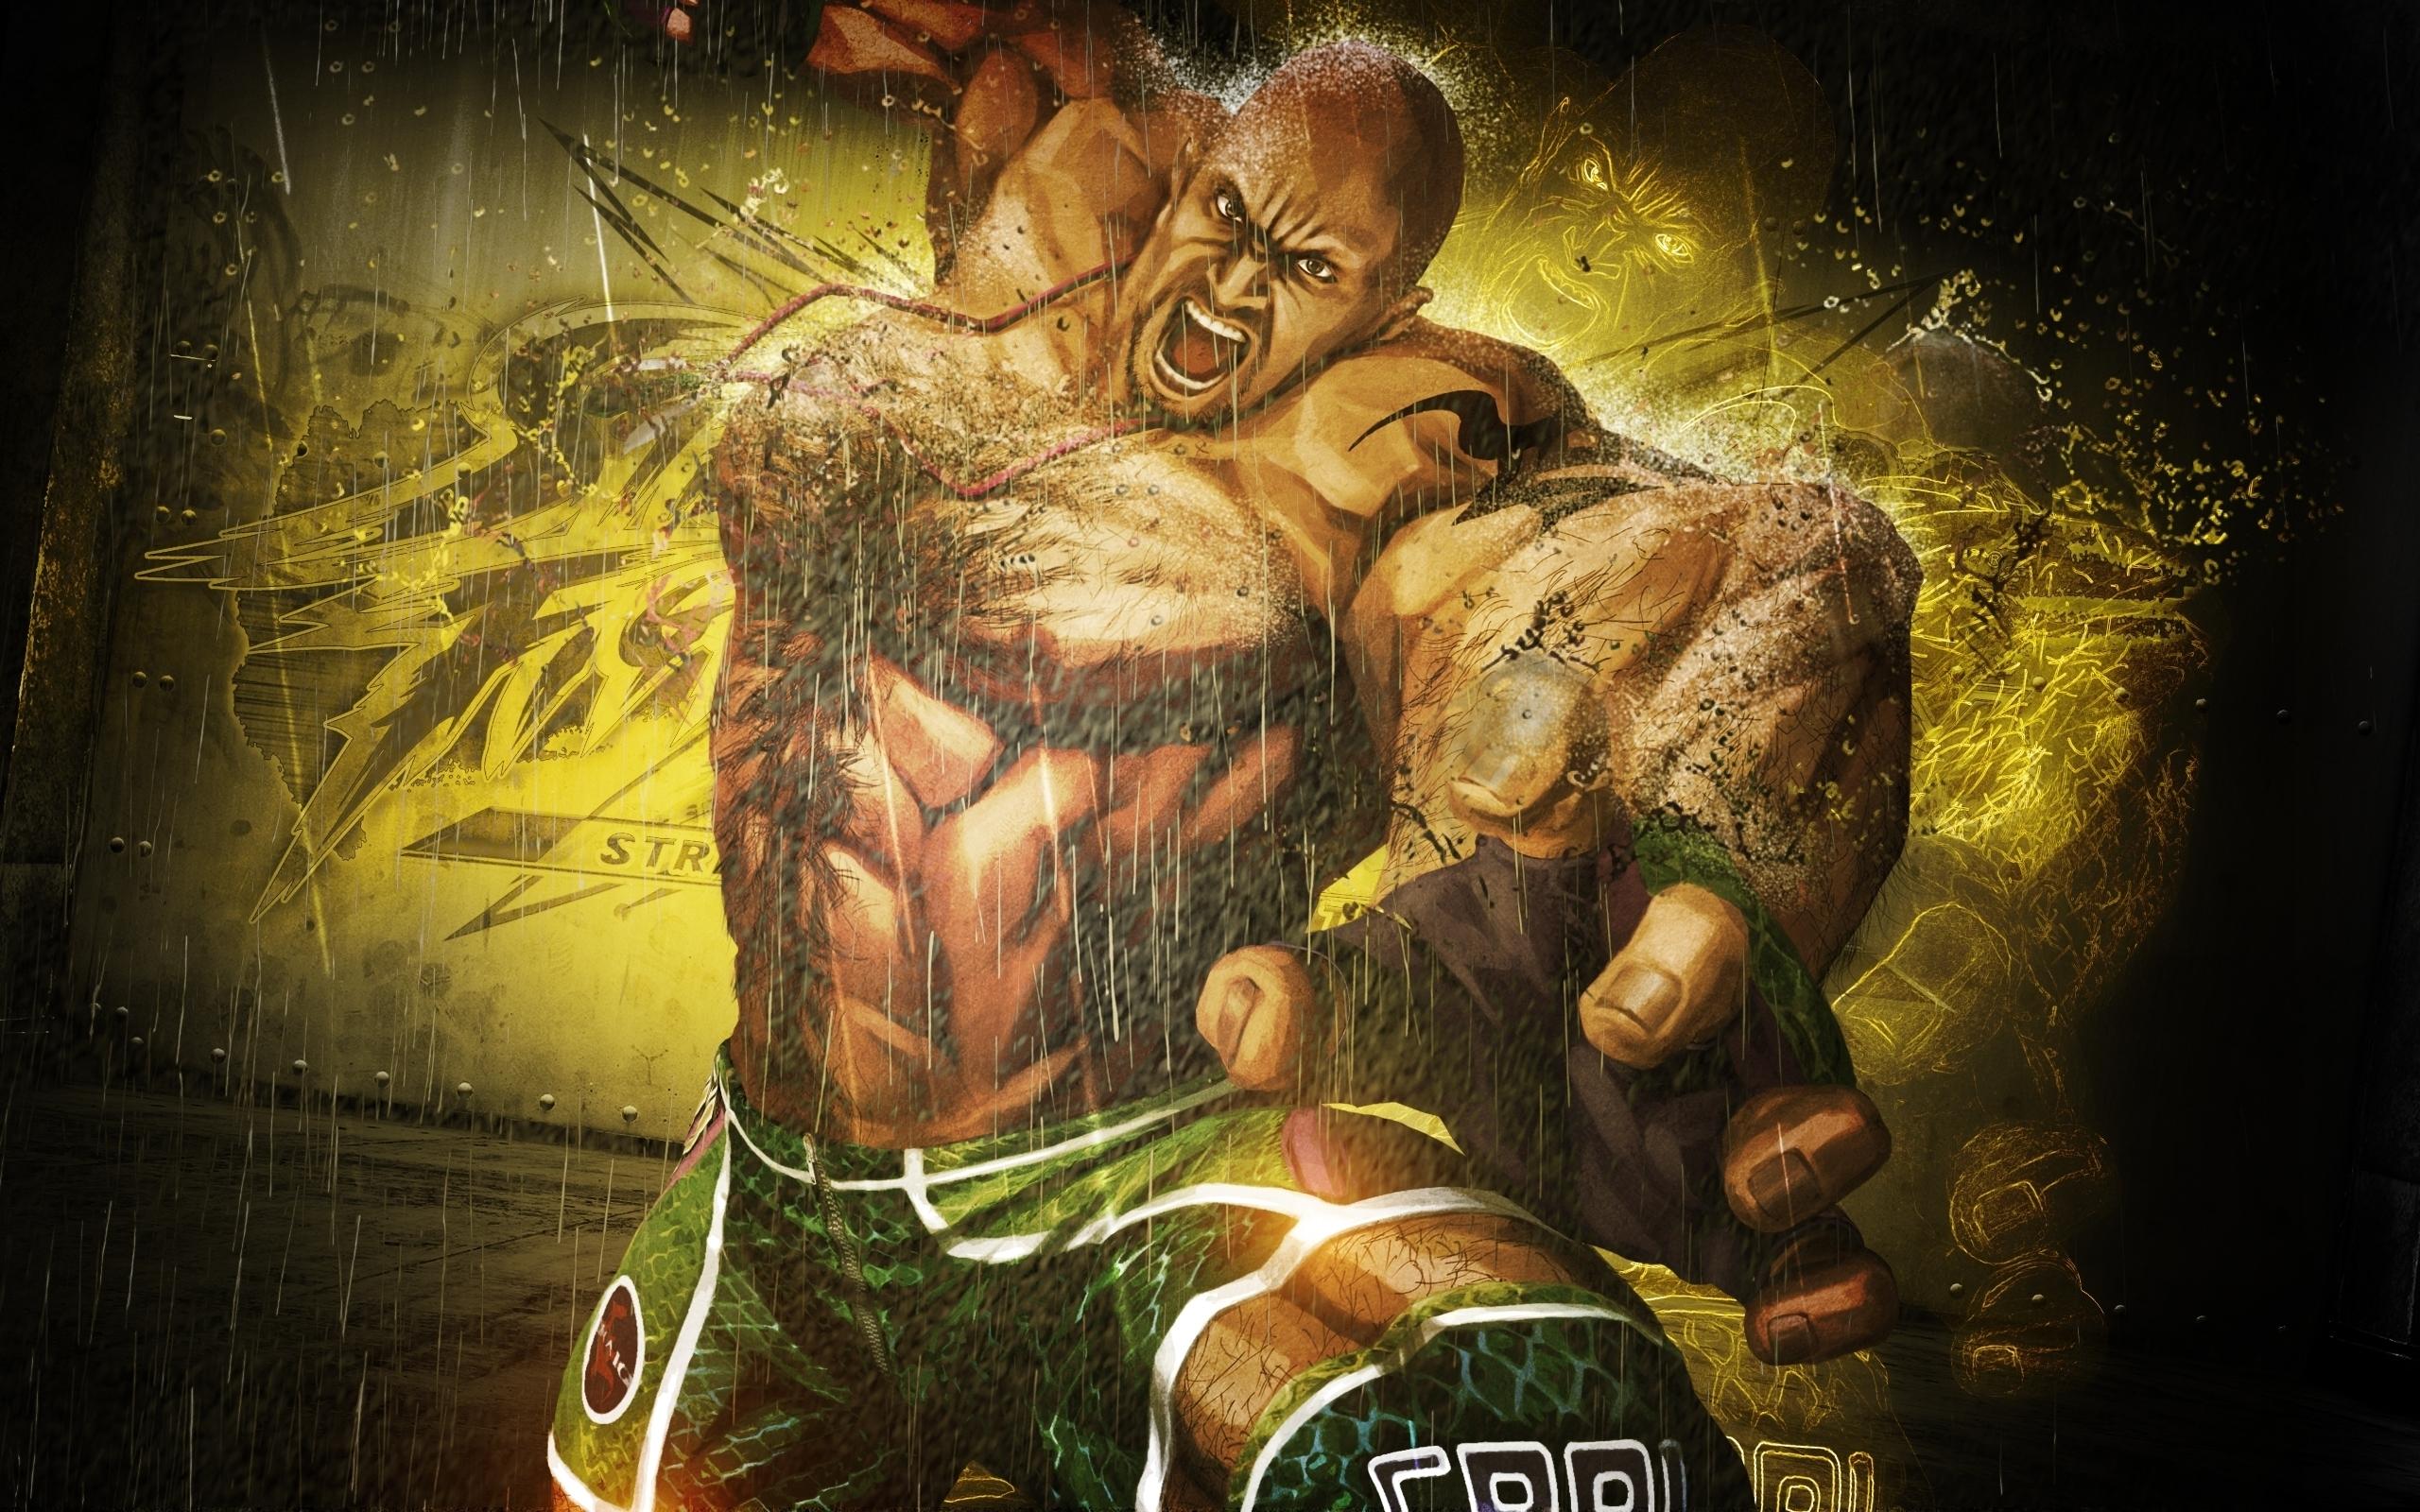 Craig Marduk In Tekken Hd Wallpaper